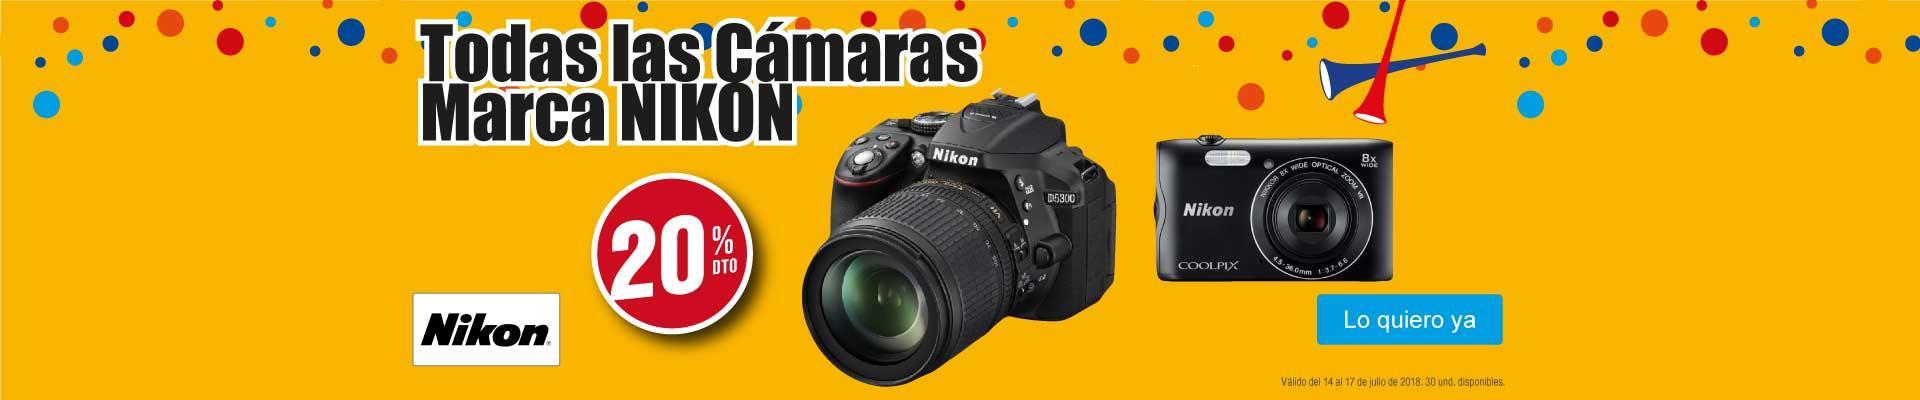 AK-PPAL-7-camaras-DCAT---Nikon-20%-Jul13